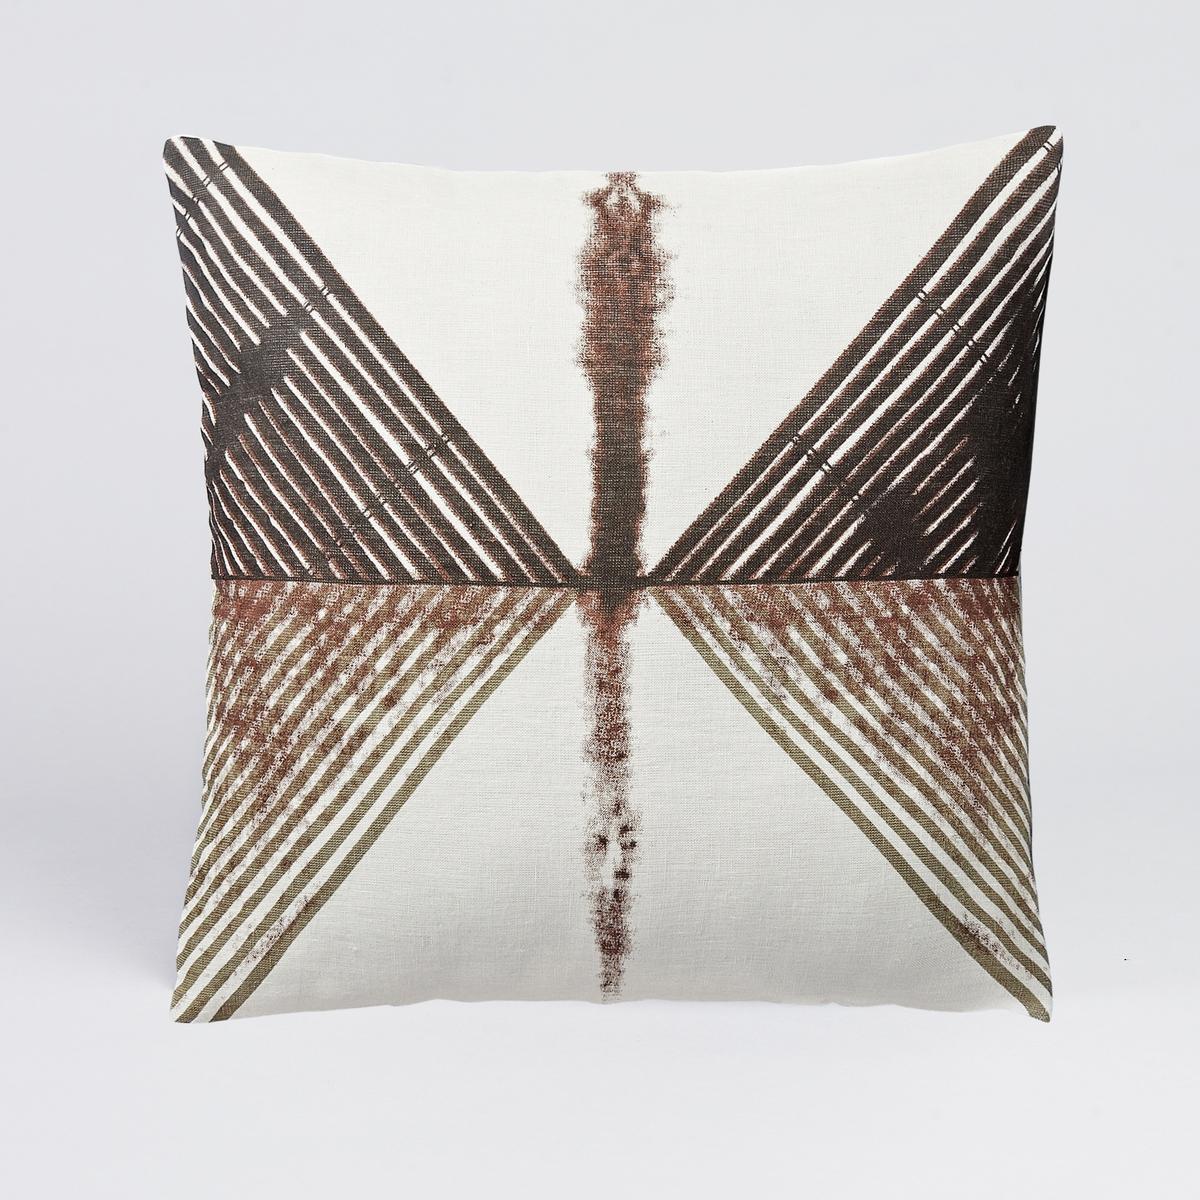 Чехол на подушку-валик Marmor<br><br>Цвет: рисунок каштан